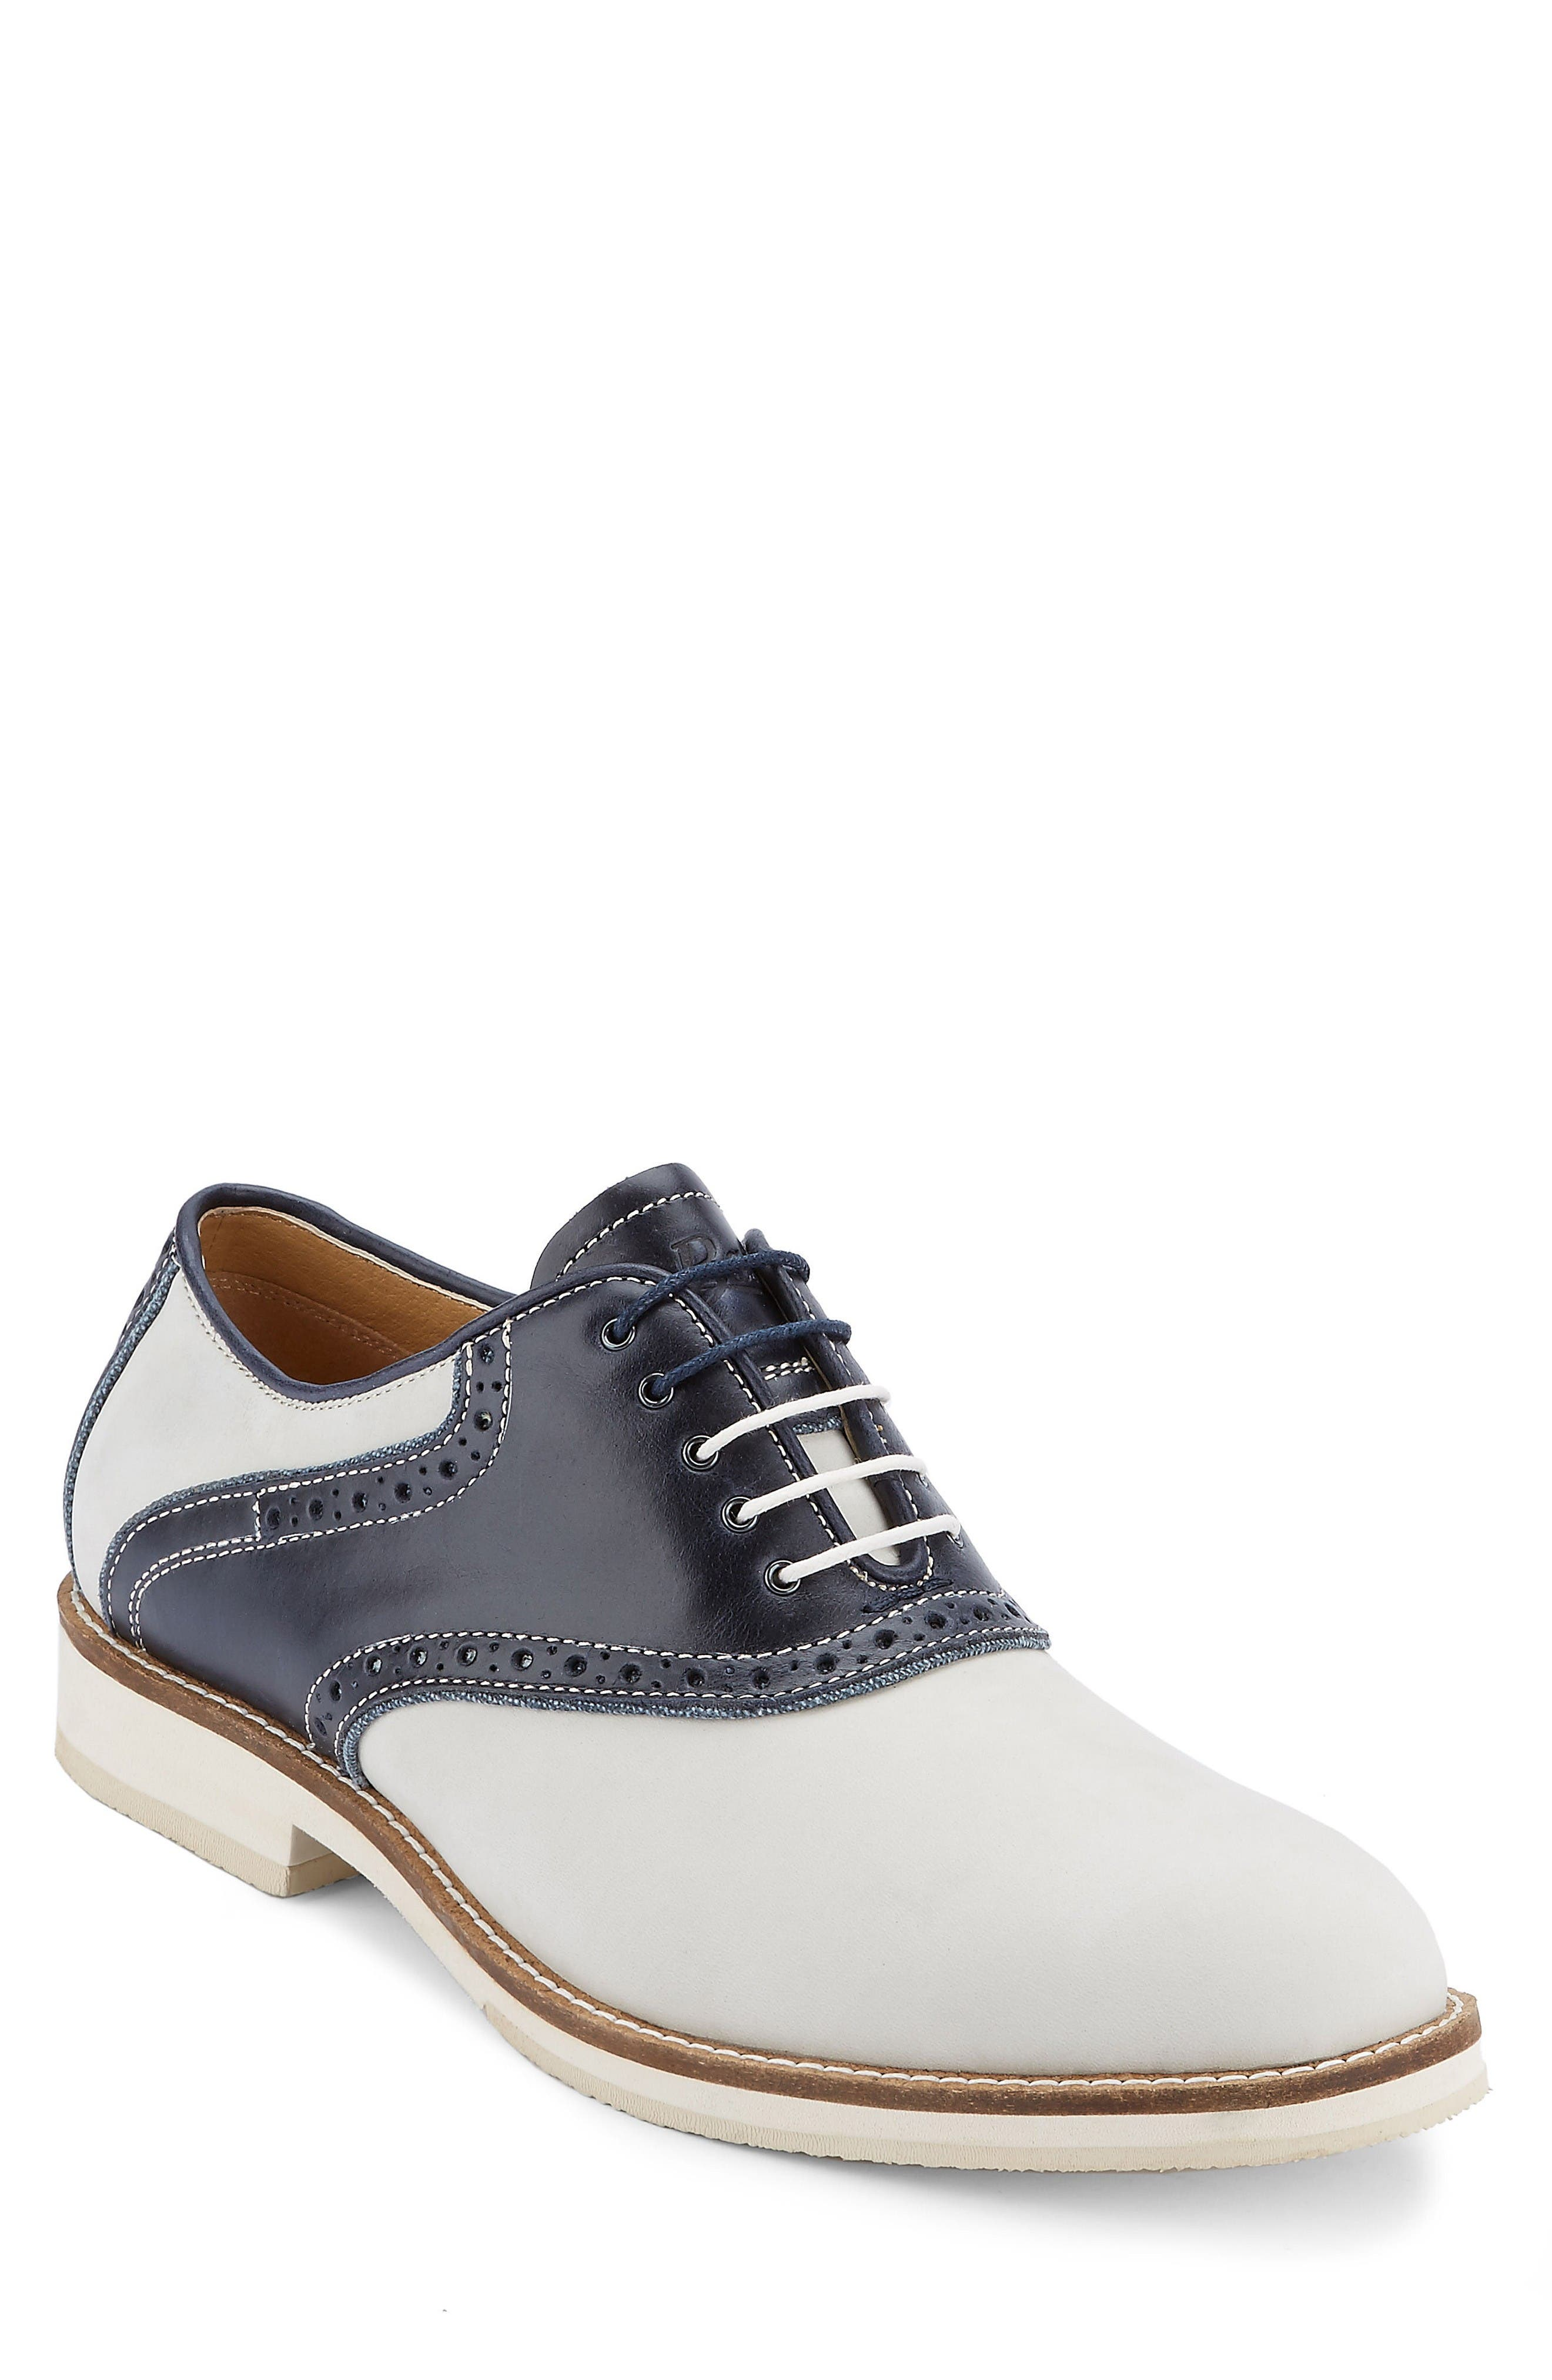 Noah Saddle Shoe,                             Main thumbnail 1, color,                             Oyster/ Navy